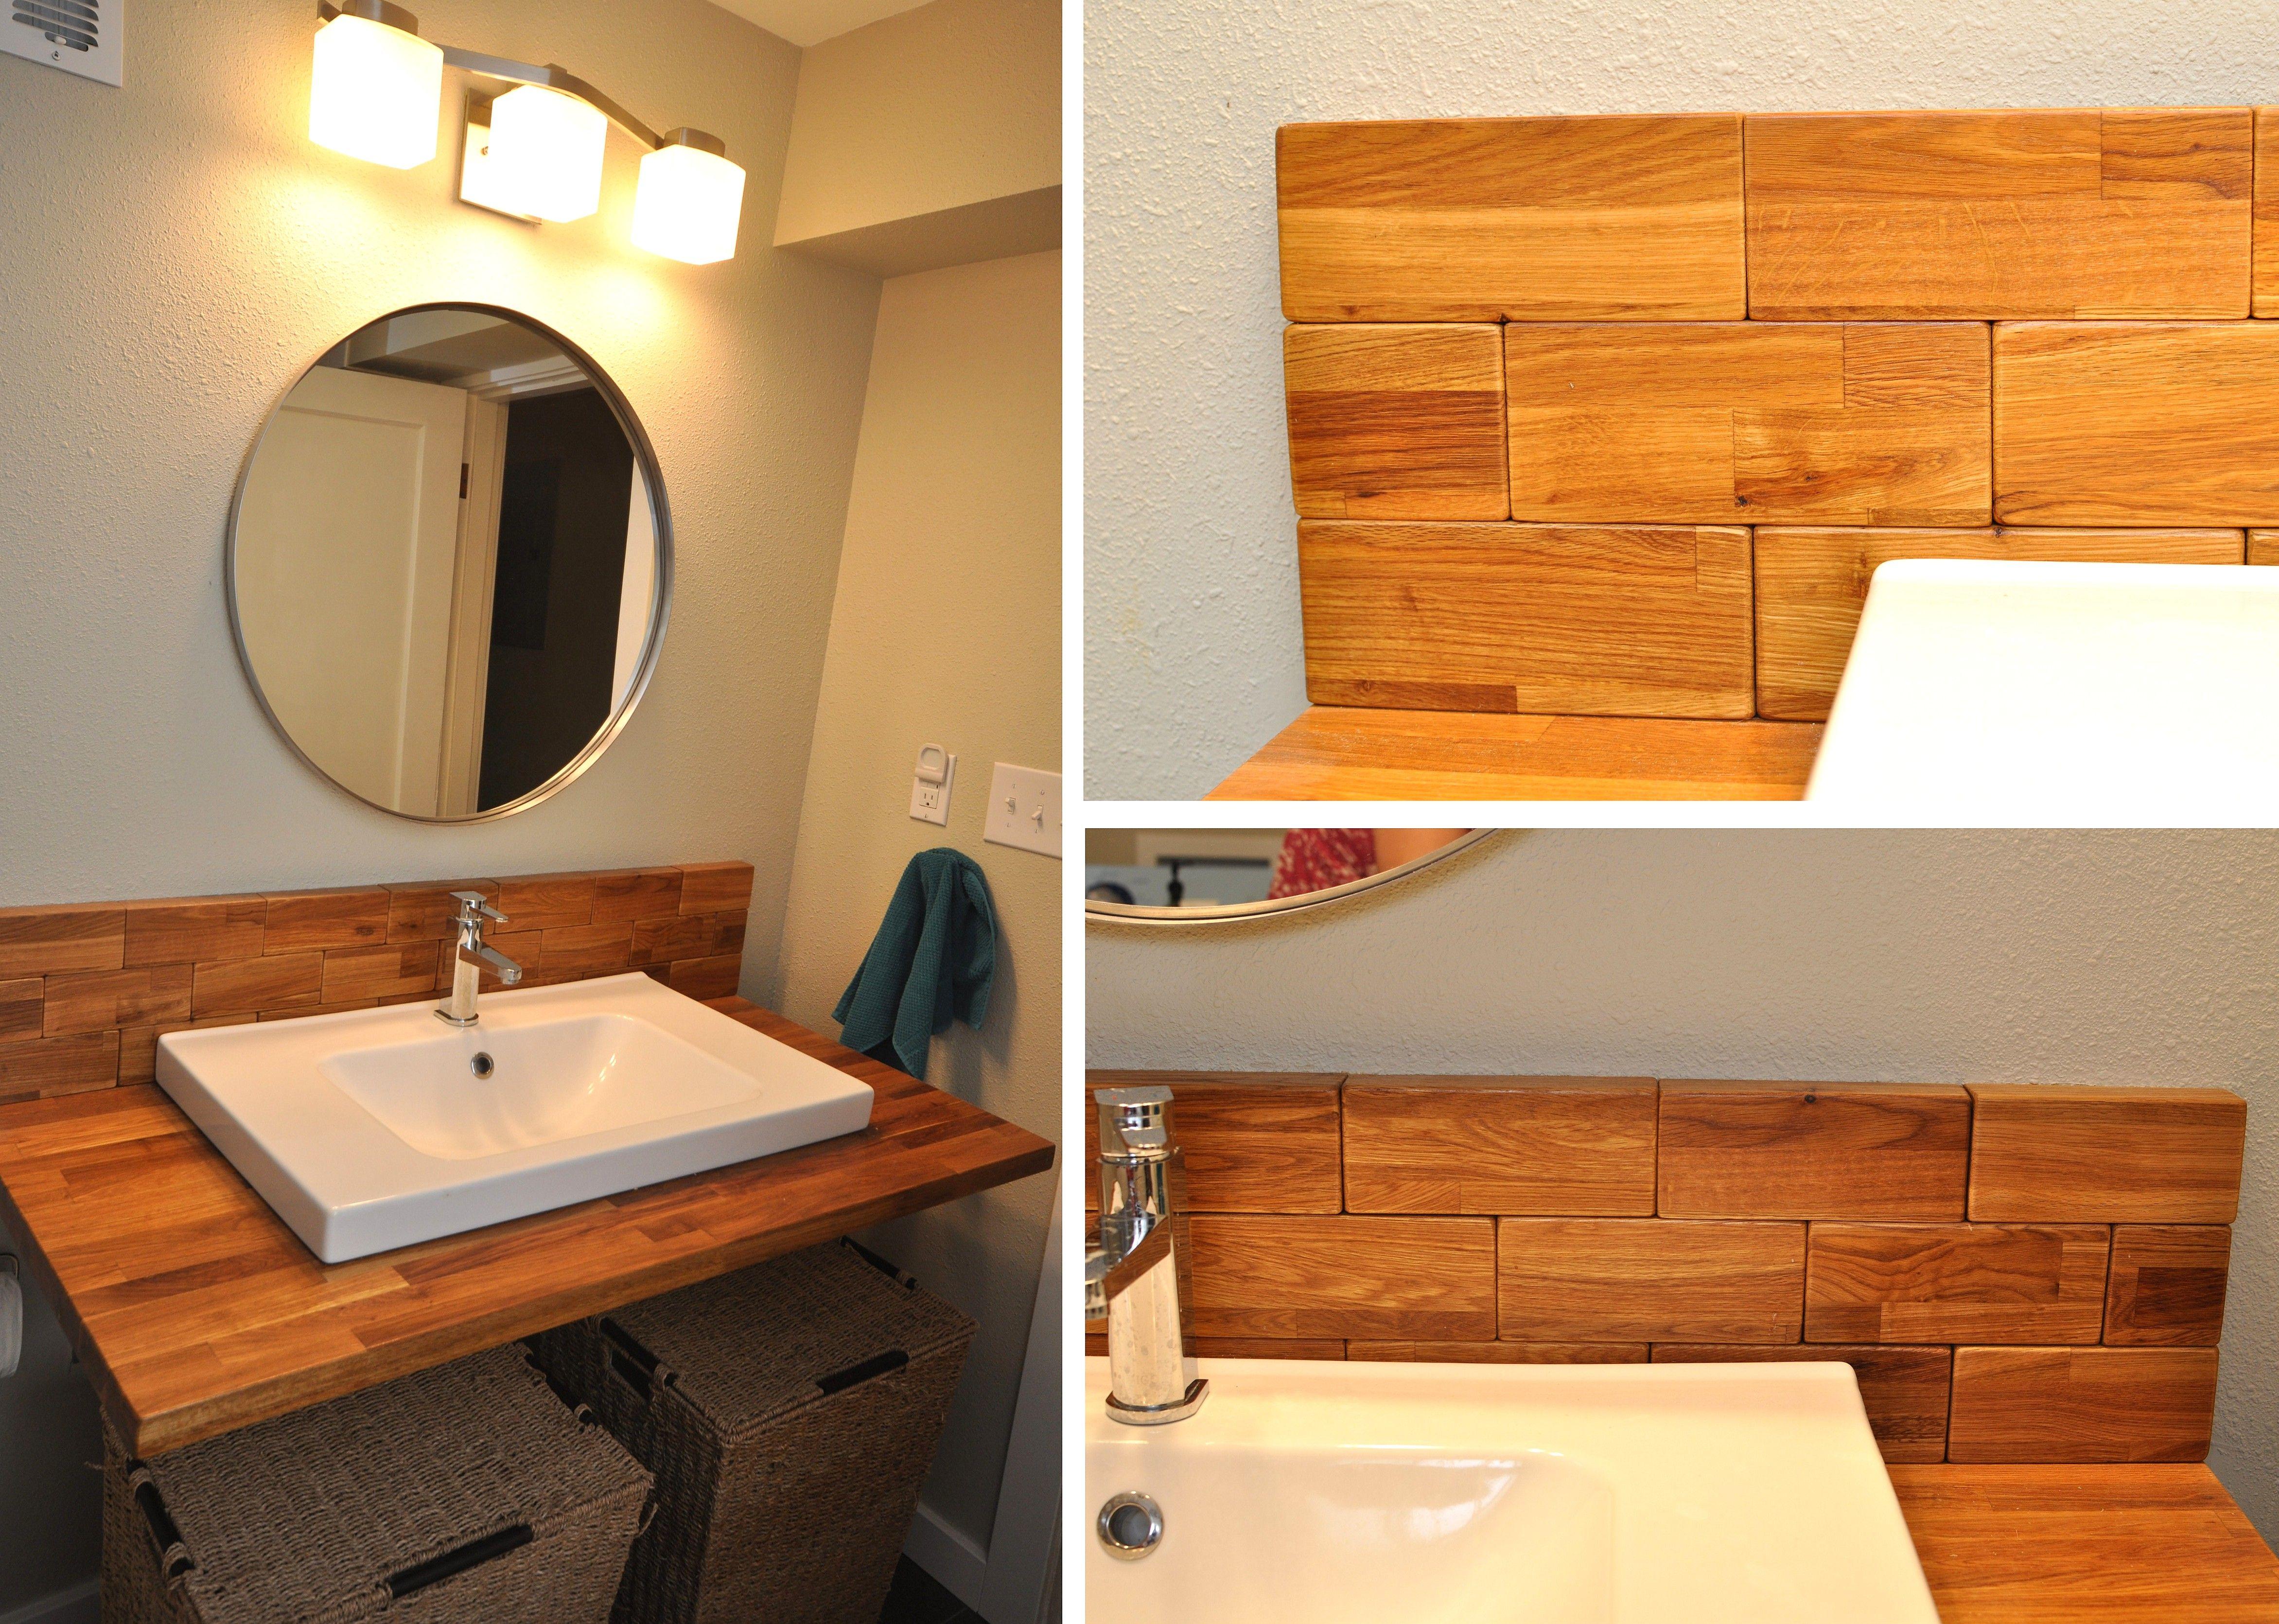 Diy wood subway tile interiors pinterest diy wood subway diy wood subway tile dailygadgetfo Images